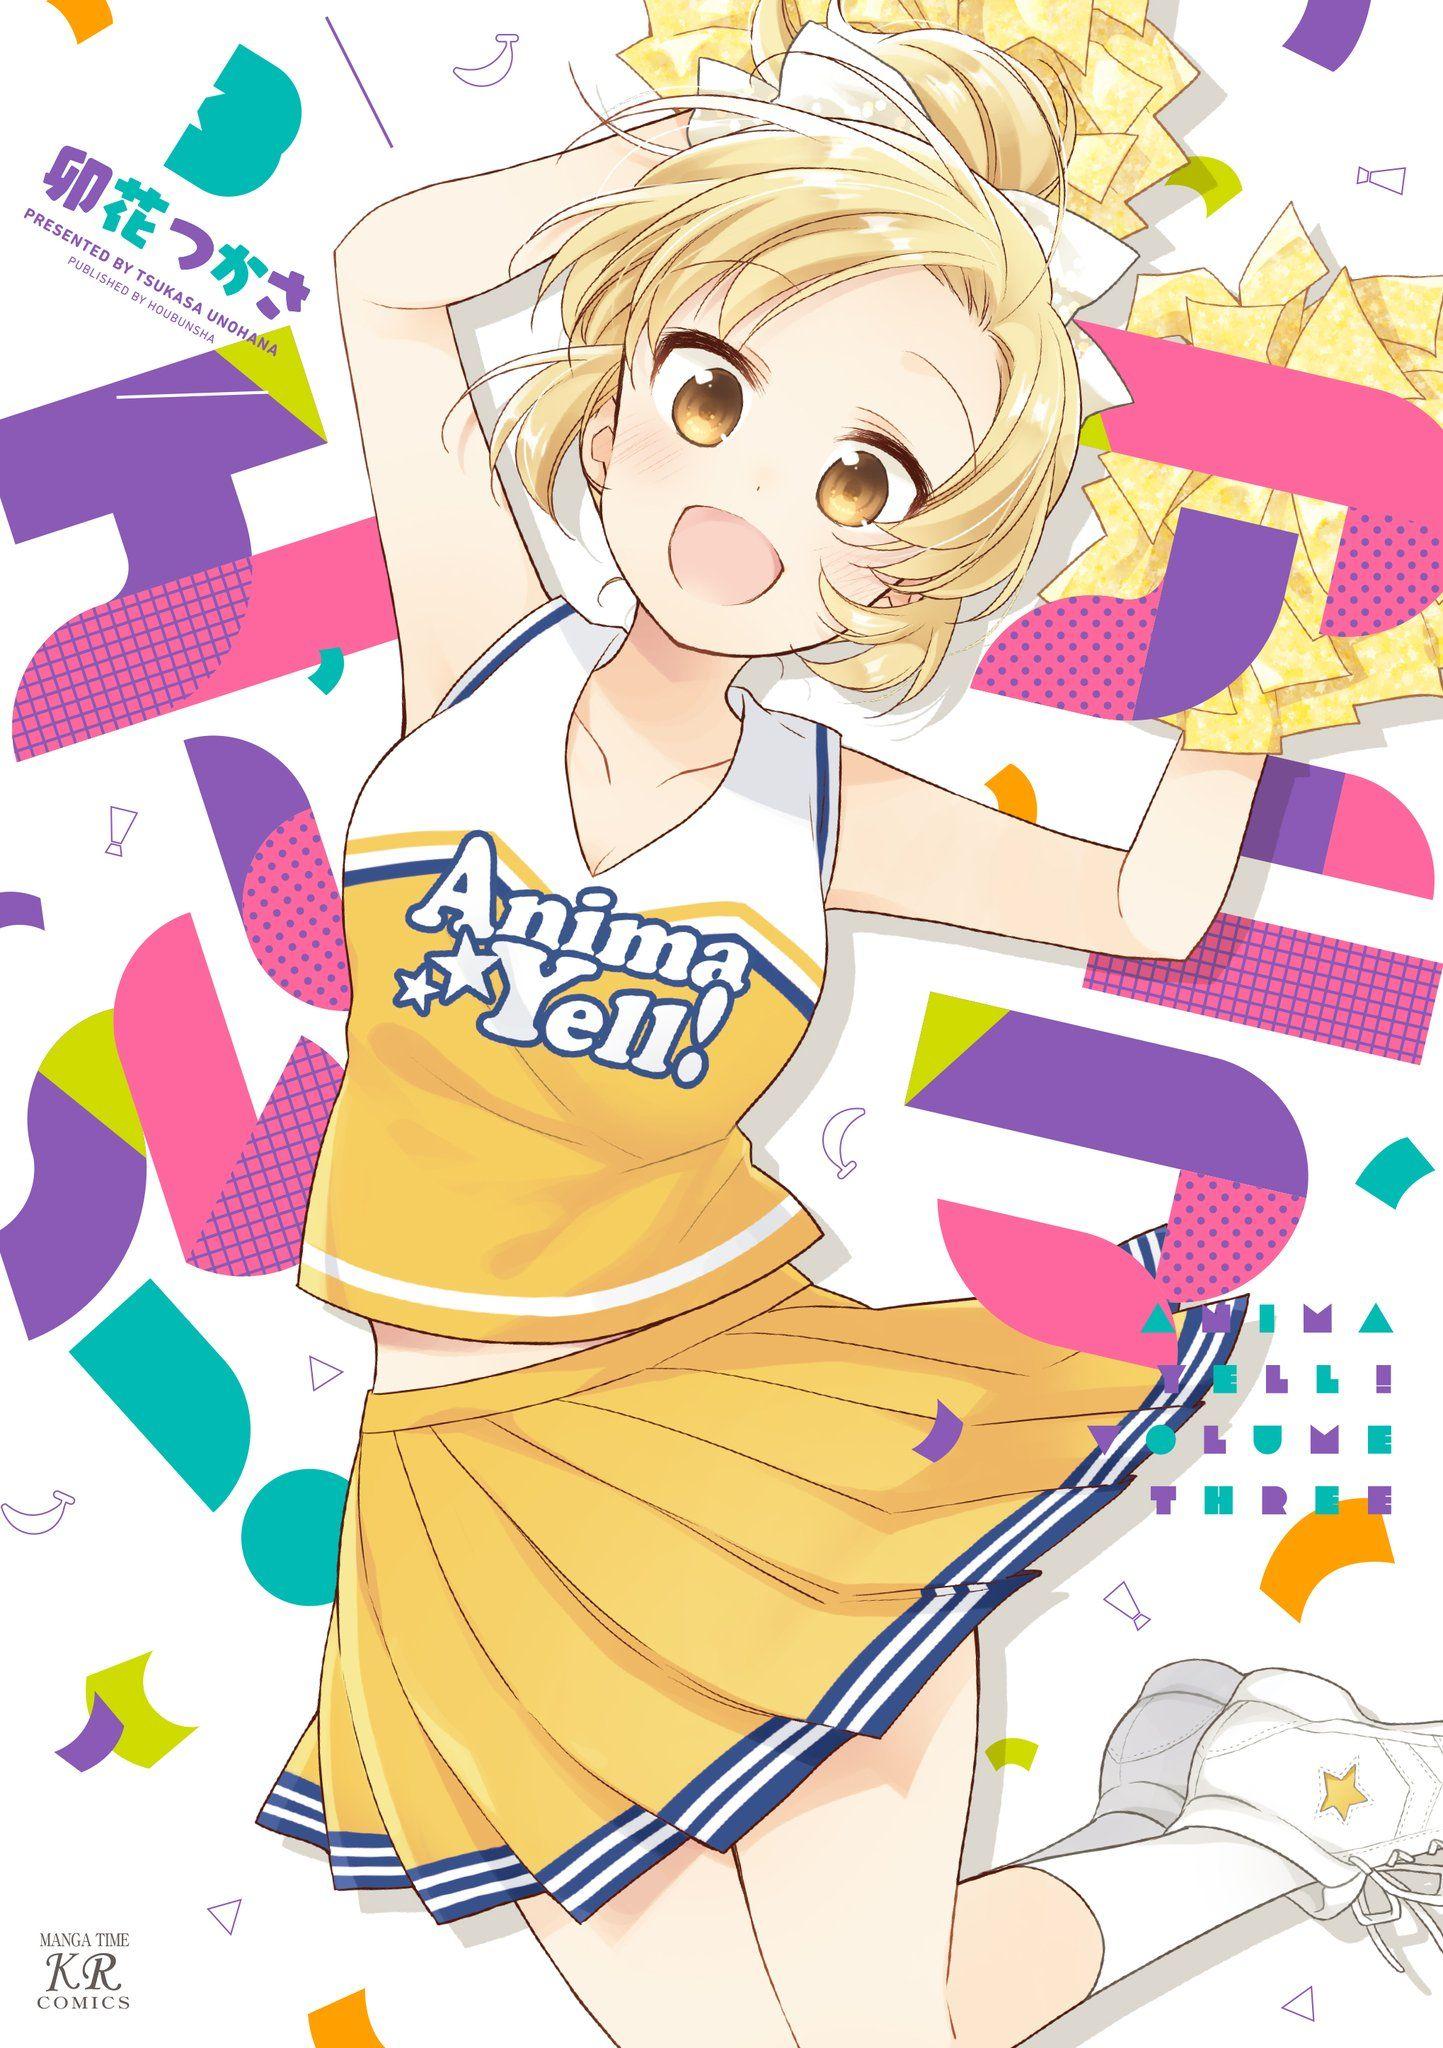 TVアニメ『アニマエール!』 on Anime, All japanese, Anime art